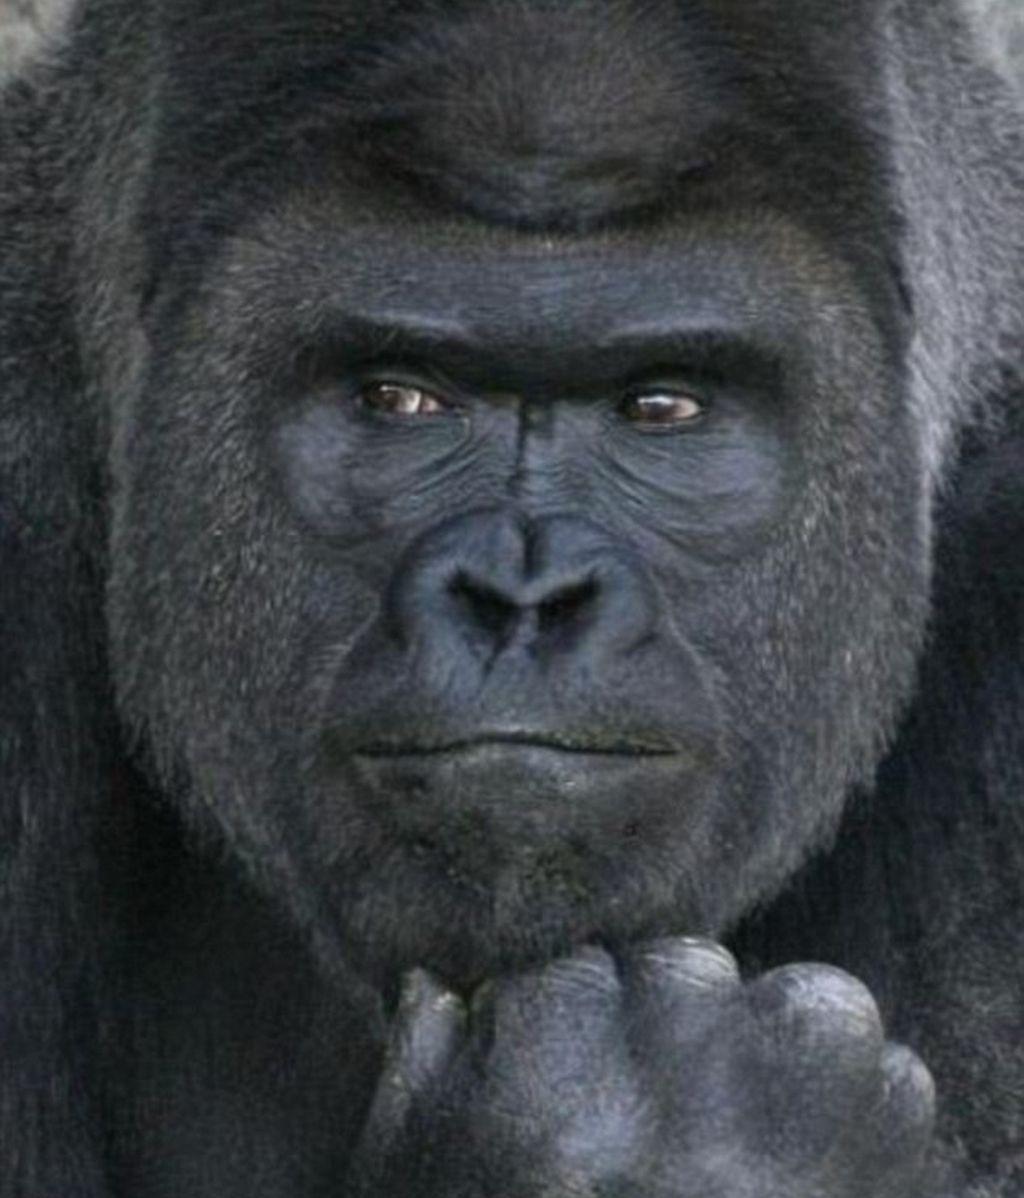 Gorila apuesto